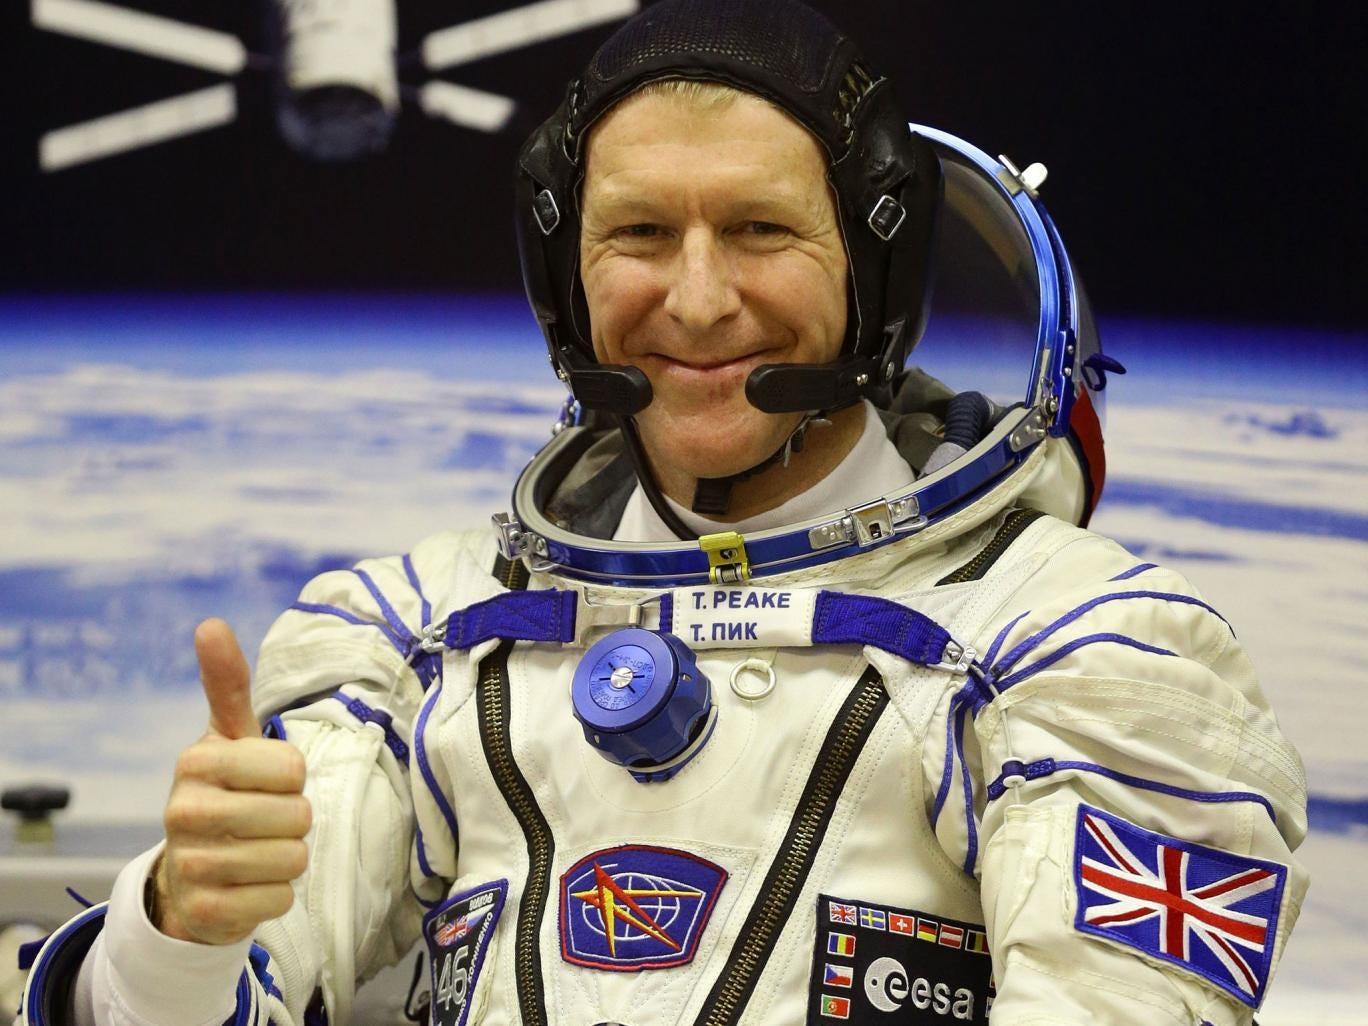 Tim Peake: UK astronaut to be first British person to walk ...